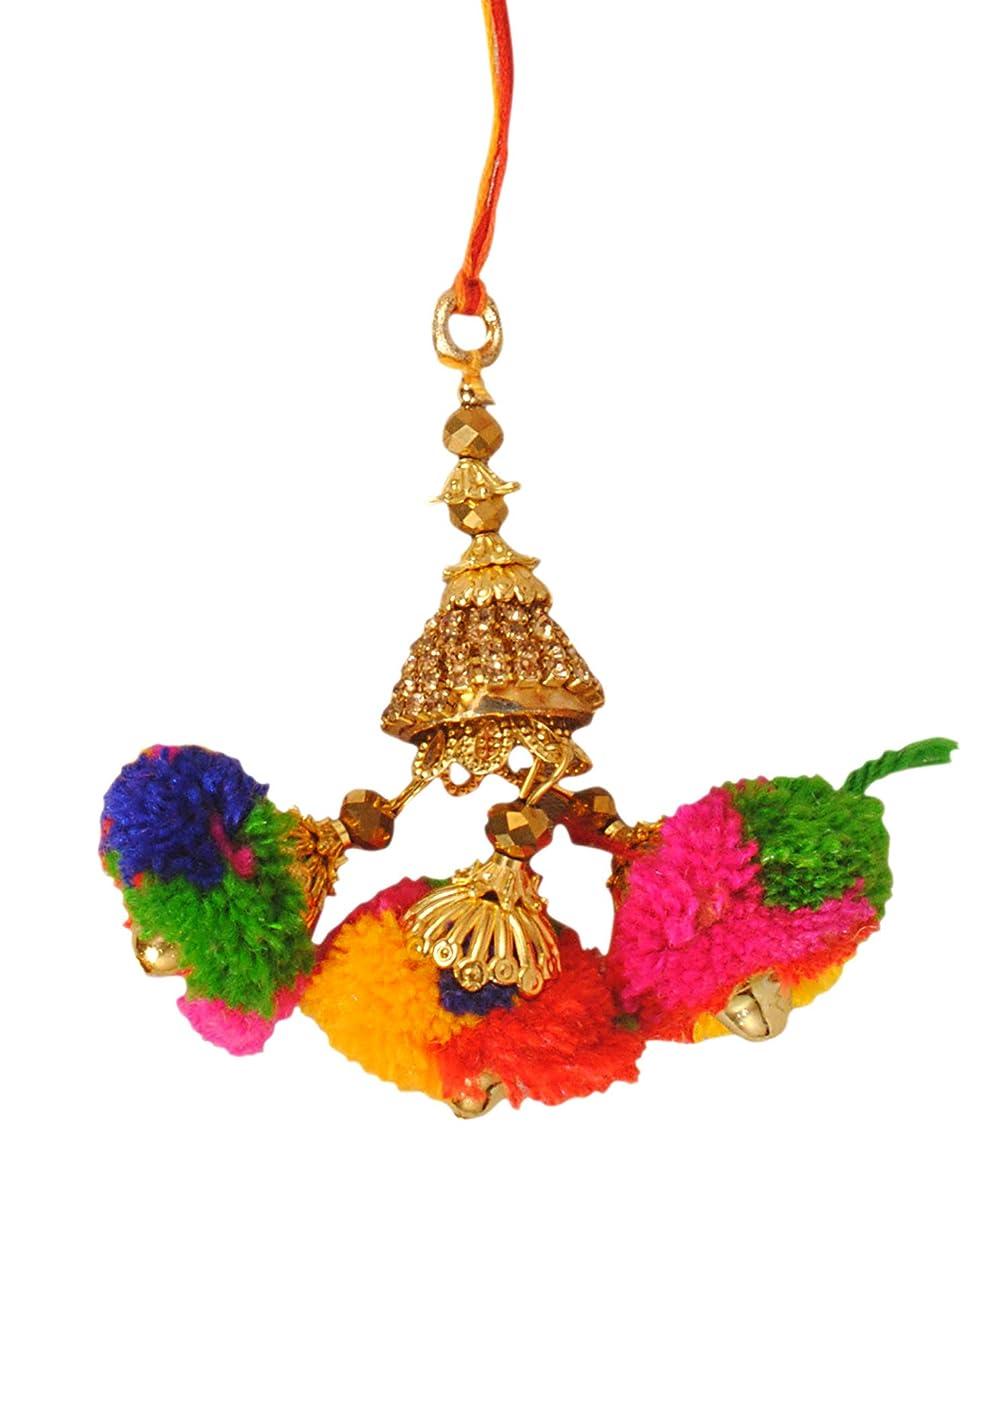 A LUMBA LATKAN for Sister in Law/BHABHI with IMMITATION ORANMENT with Colourful Thread Rakhi/Rakhee for Bhaiya Brother/Sisters,Traditional Rakhi,Thread,Bracelet for rakshabandhan